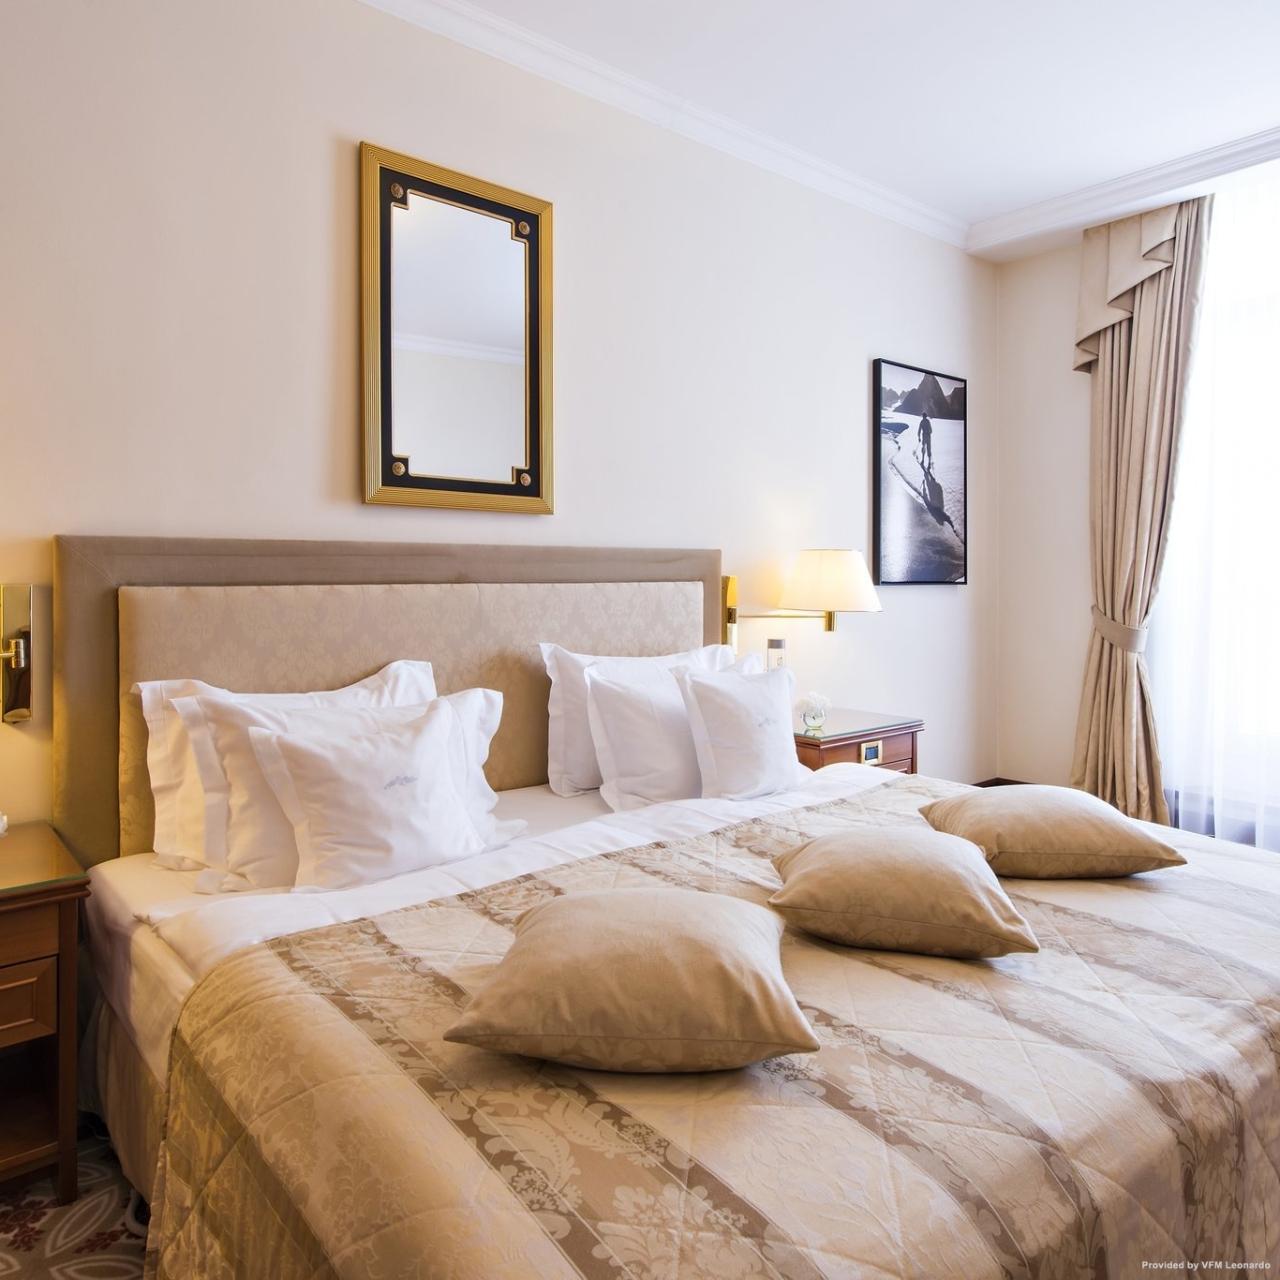 Kempinski Grand Hotel Des Bains Sankt Moritz Grisons At Hrs With Free Services